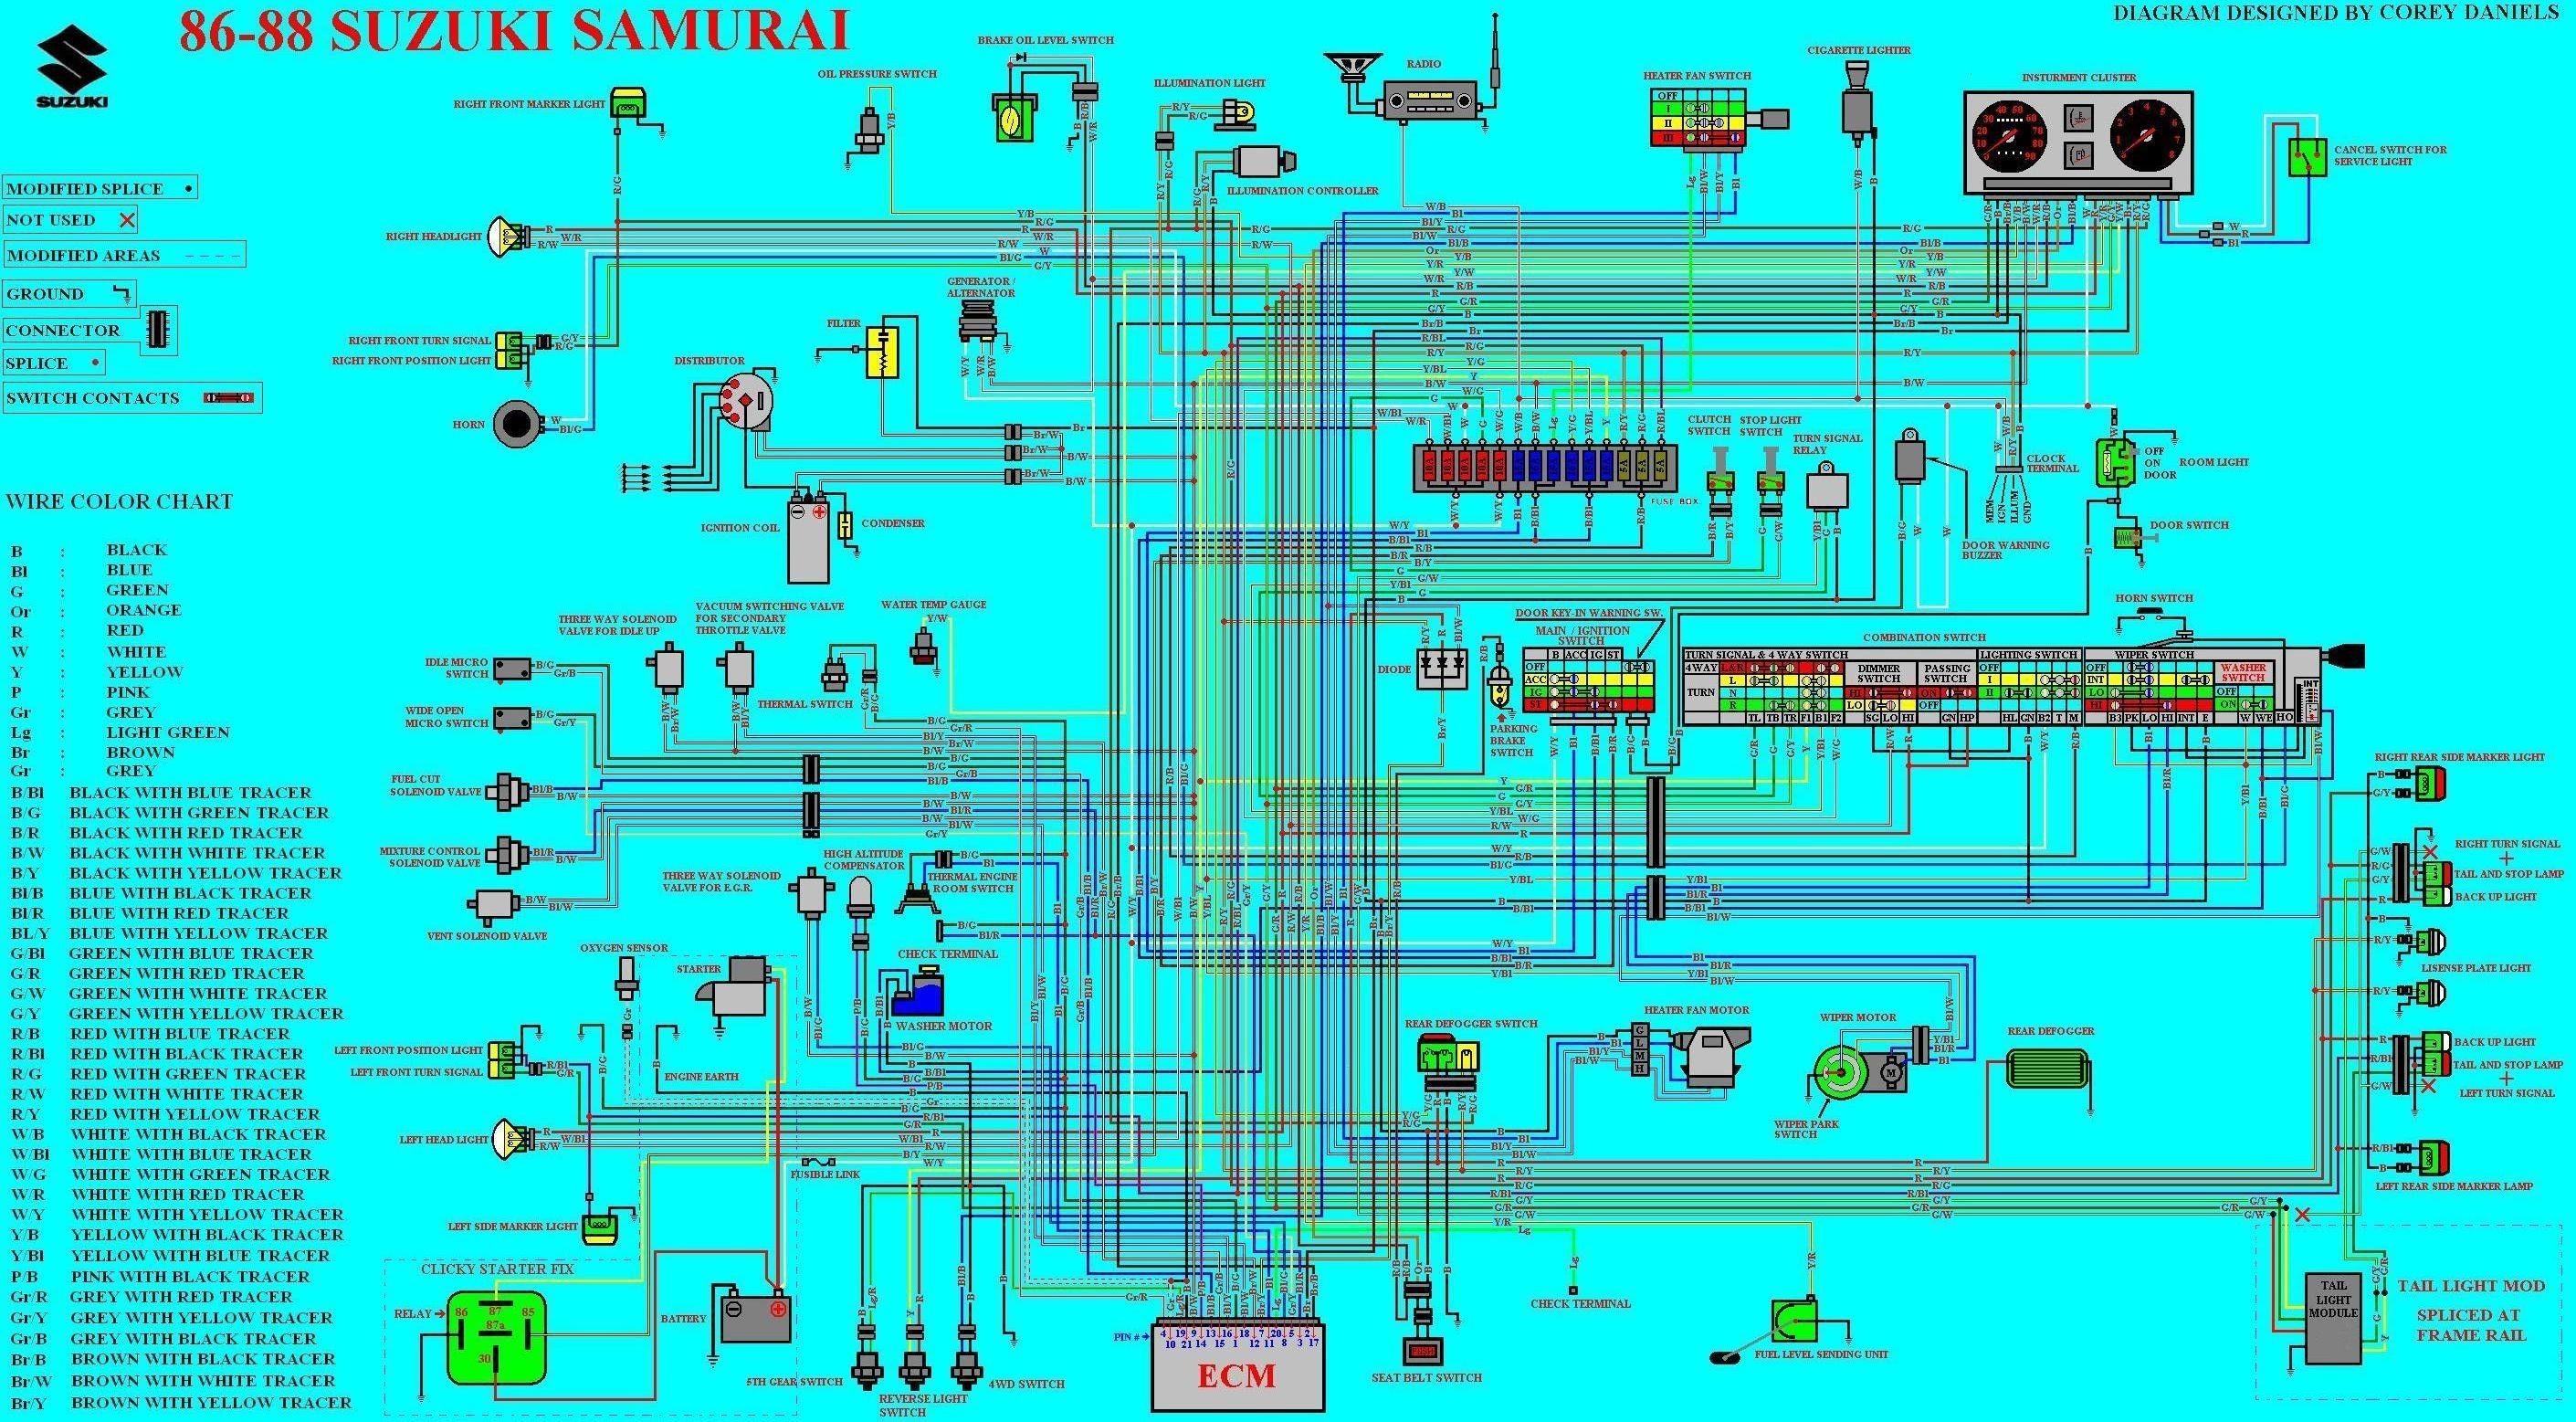 Suzuki Samurai Alternator Wiring Diagram Suzuki Alternator Wiring Diagram Wiring Diagram Schematic Of Suzuki Samurai Alternator Wiring Diagram